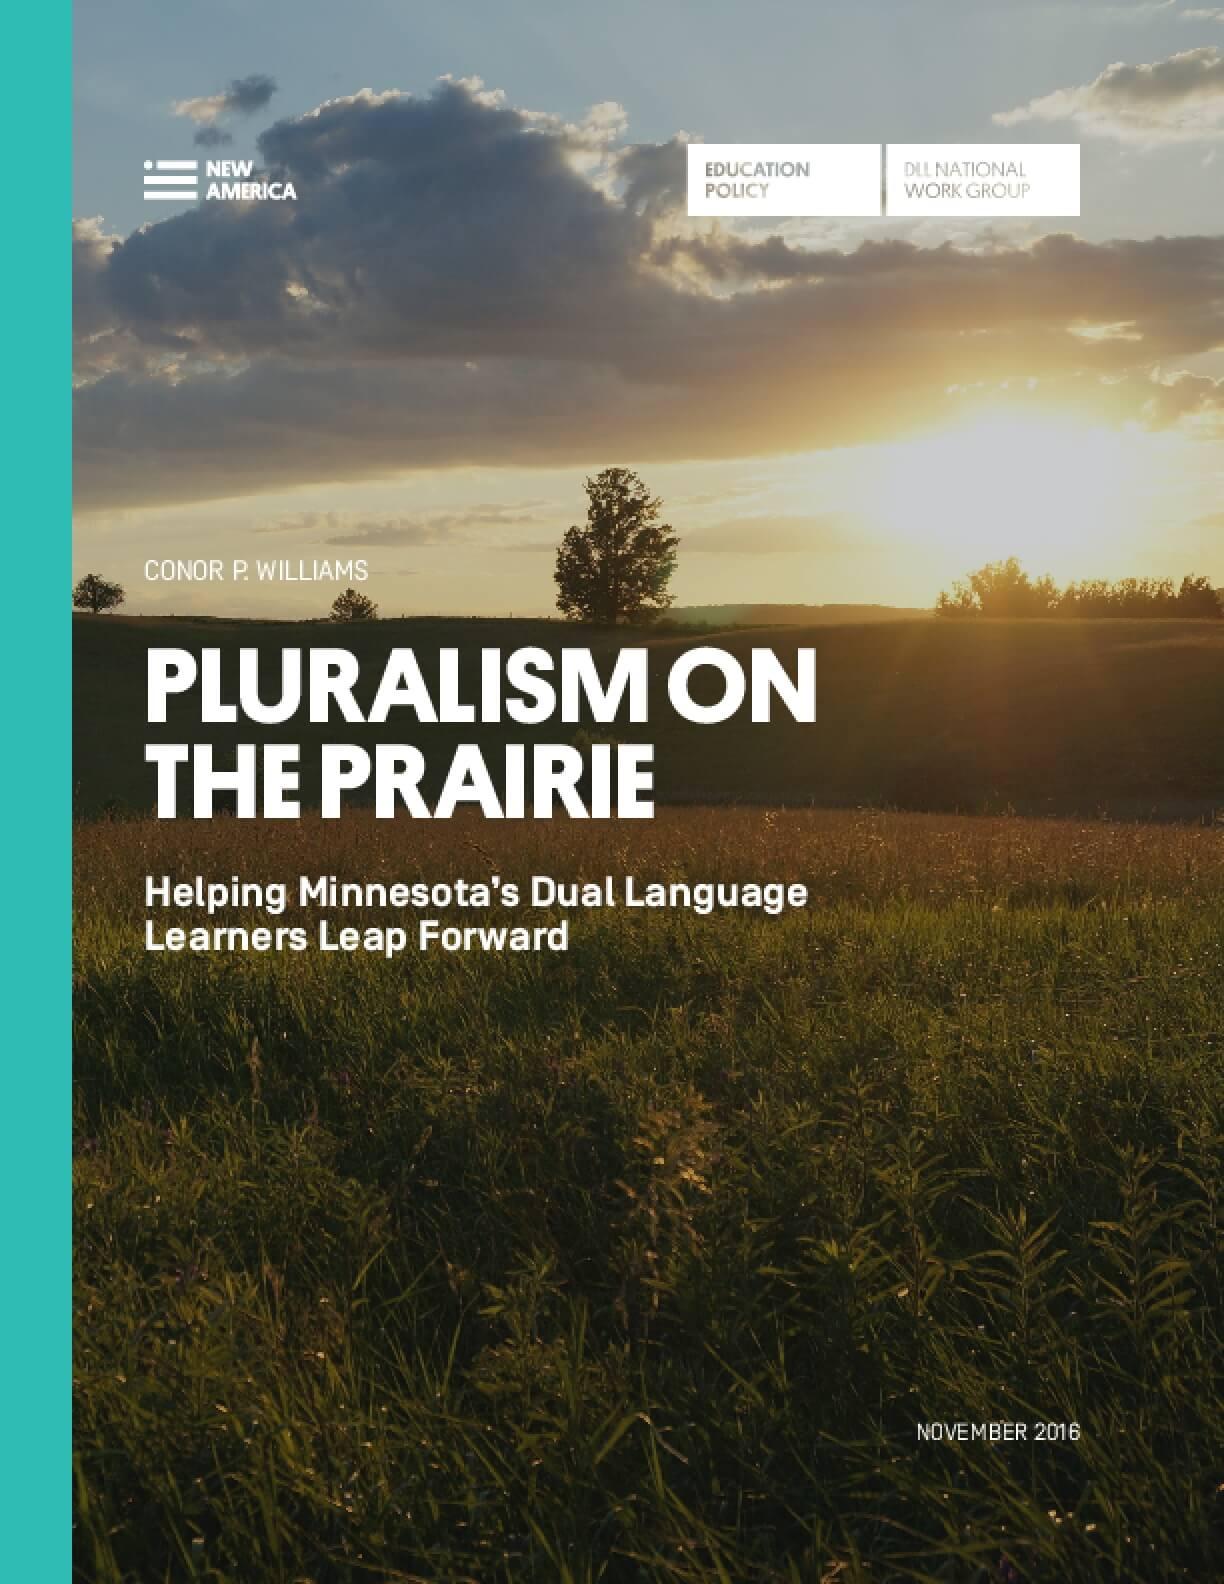 Pluralism on the Prairie: Helping Minnesota's Dual Language Learners Leap Forward